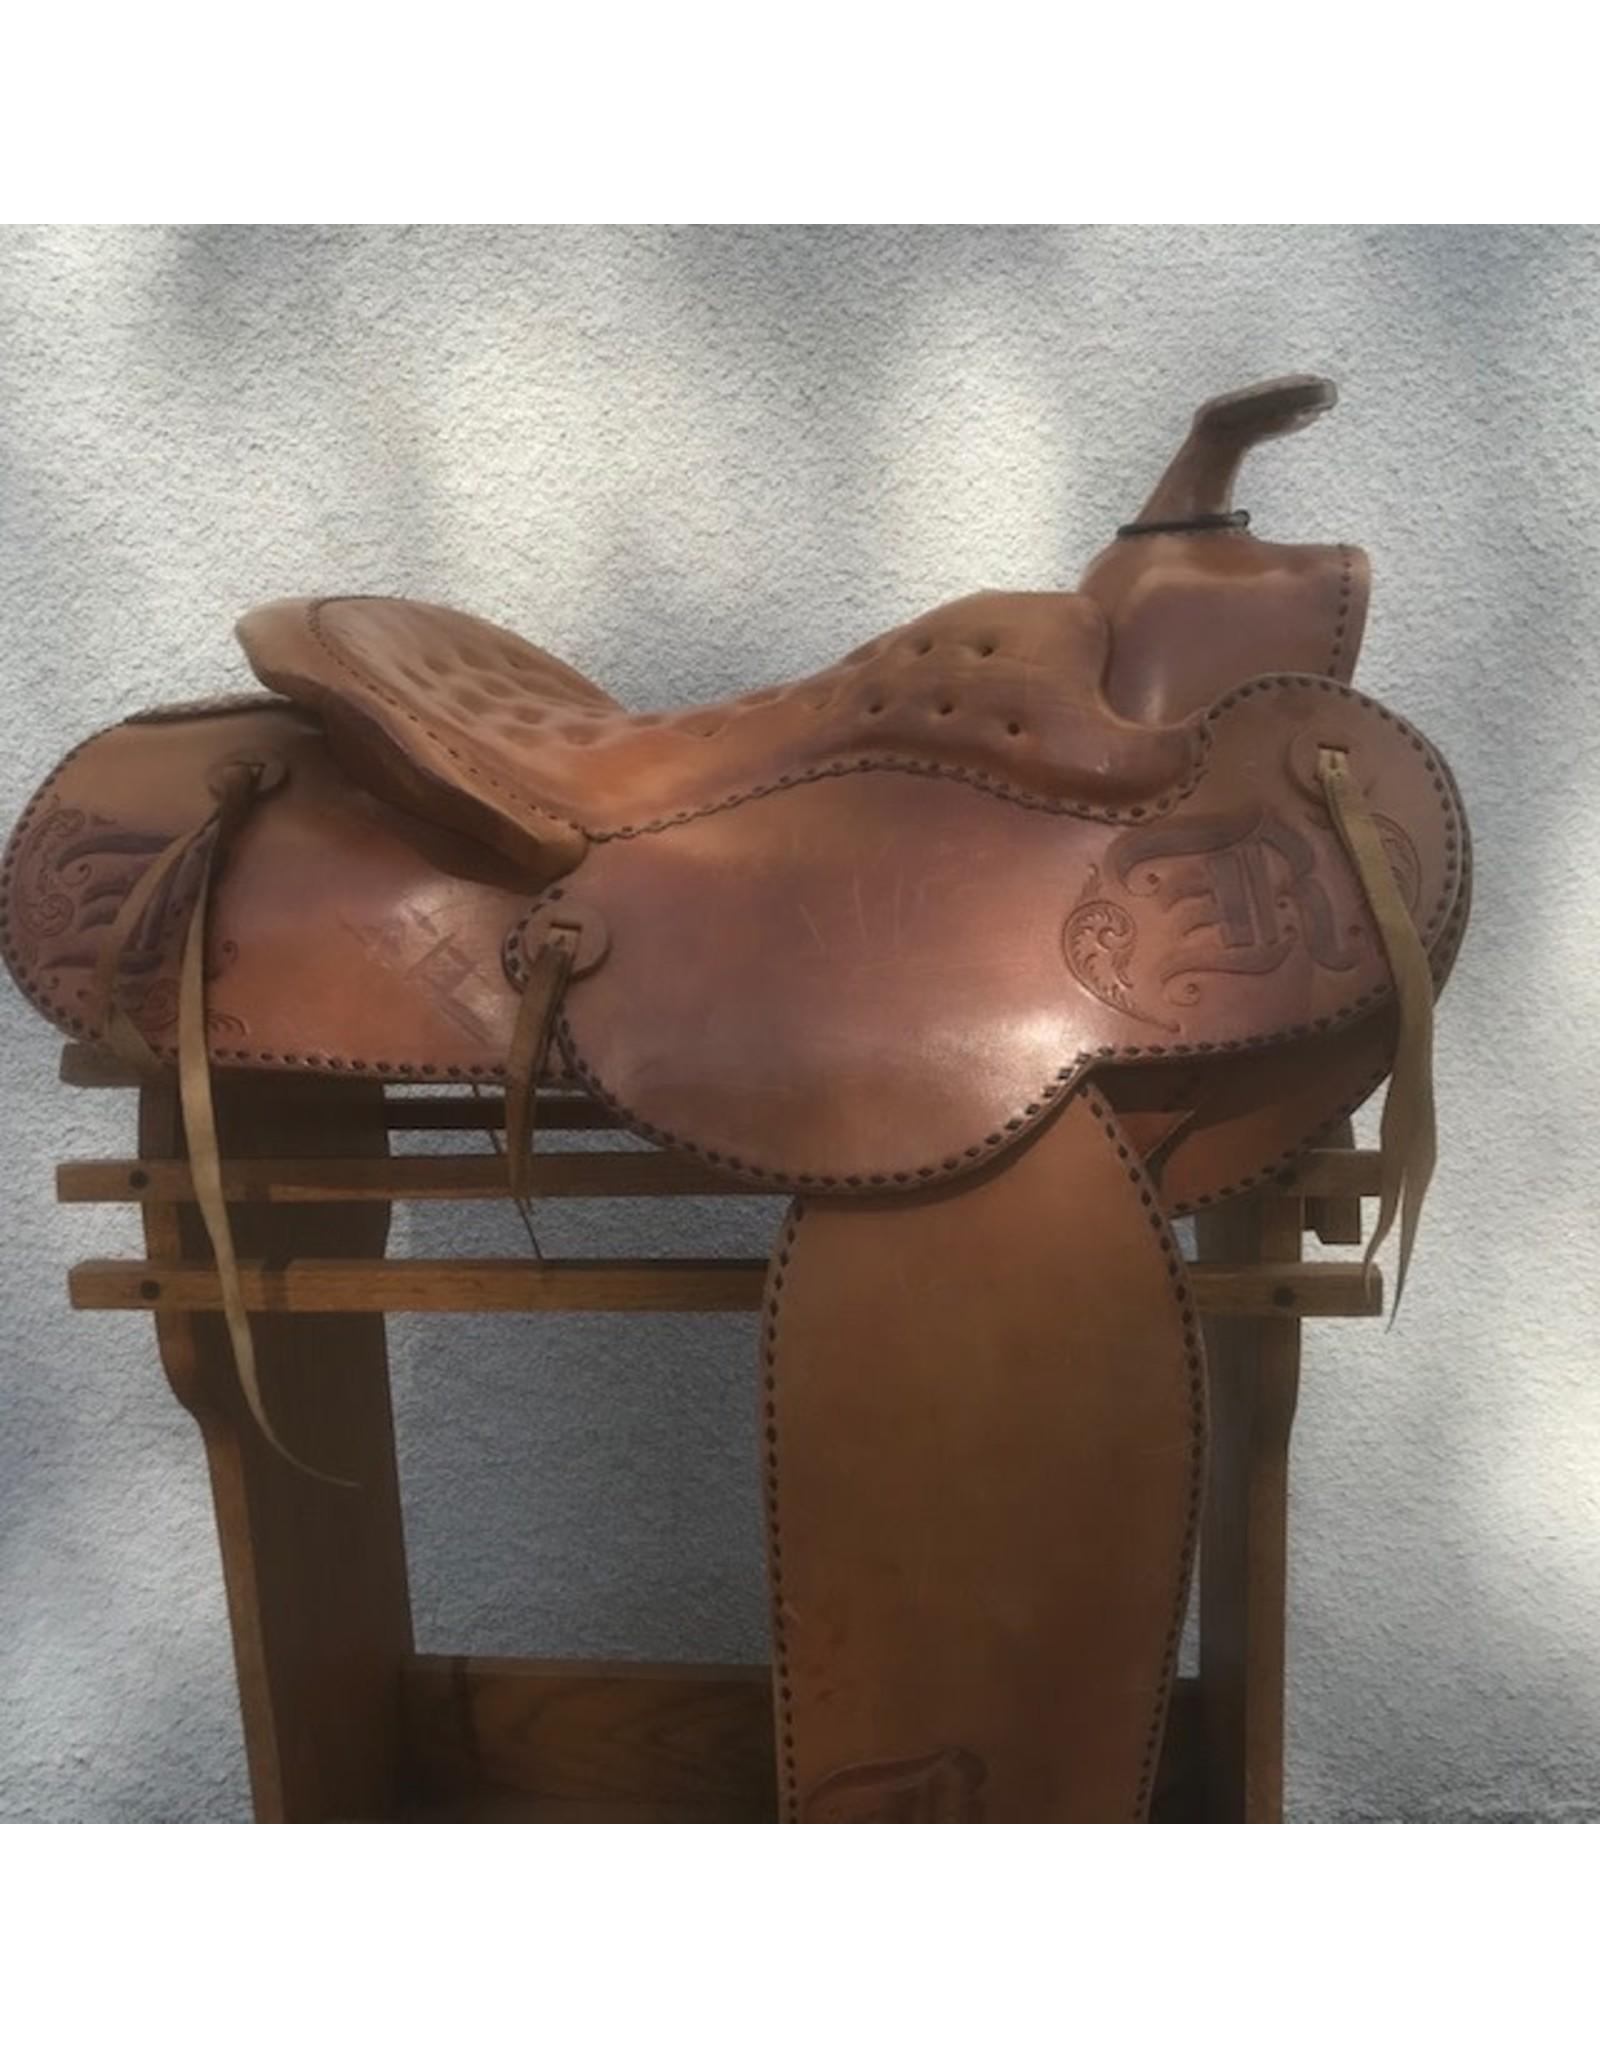 "Jack Thomas Western 15"" Semi-Quarter Horse Bars"